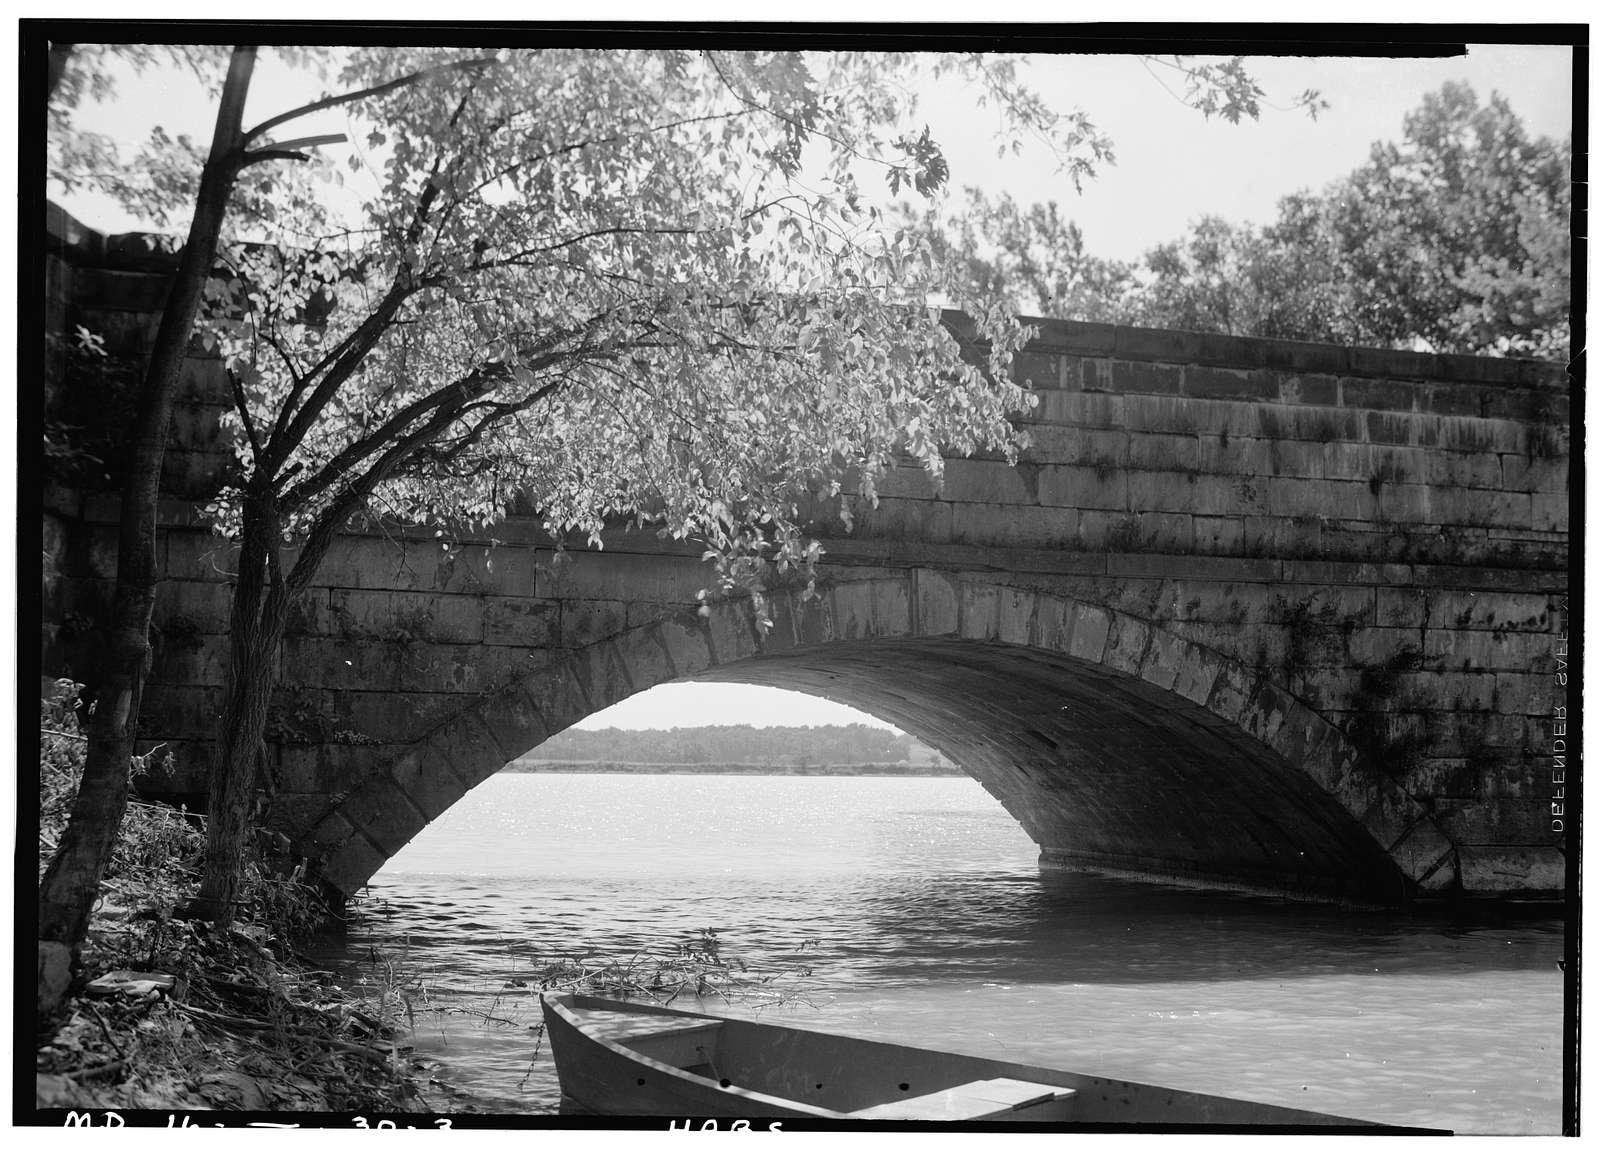 Chesapeake & Ohio Canal, Aqueduct No. 1, Riley's Lock Road Vicinity, State Route 190, Seneca, Montgomery County, MD